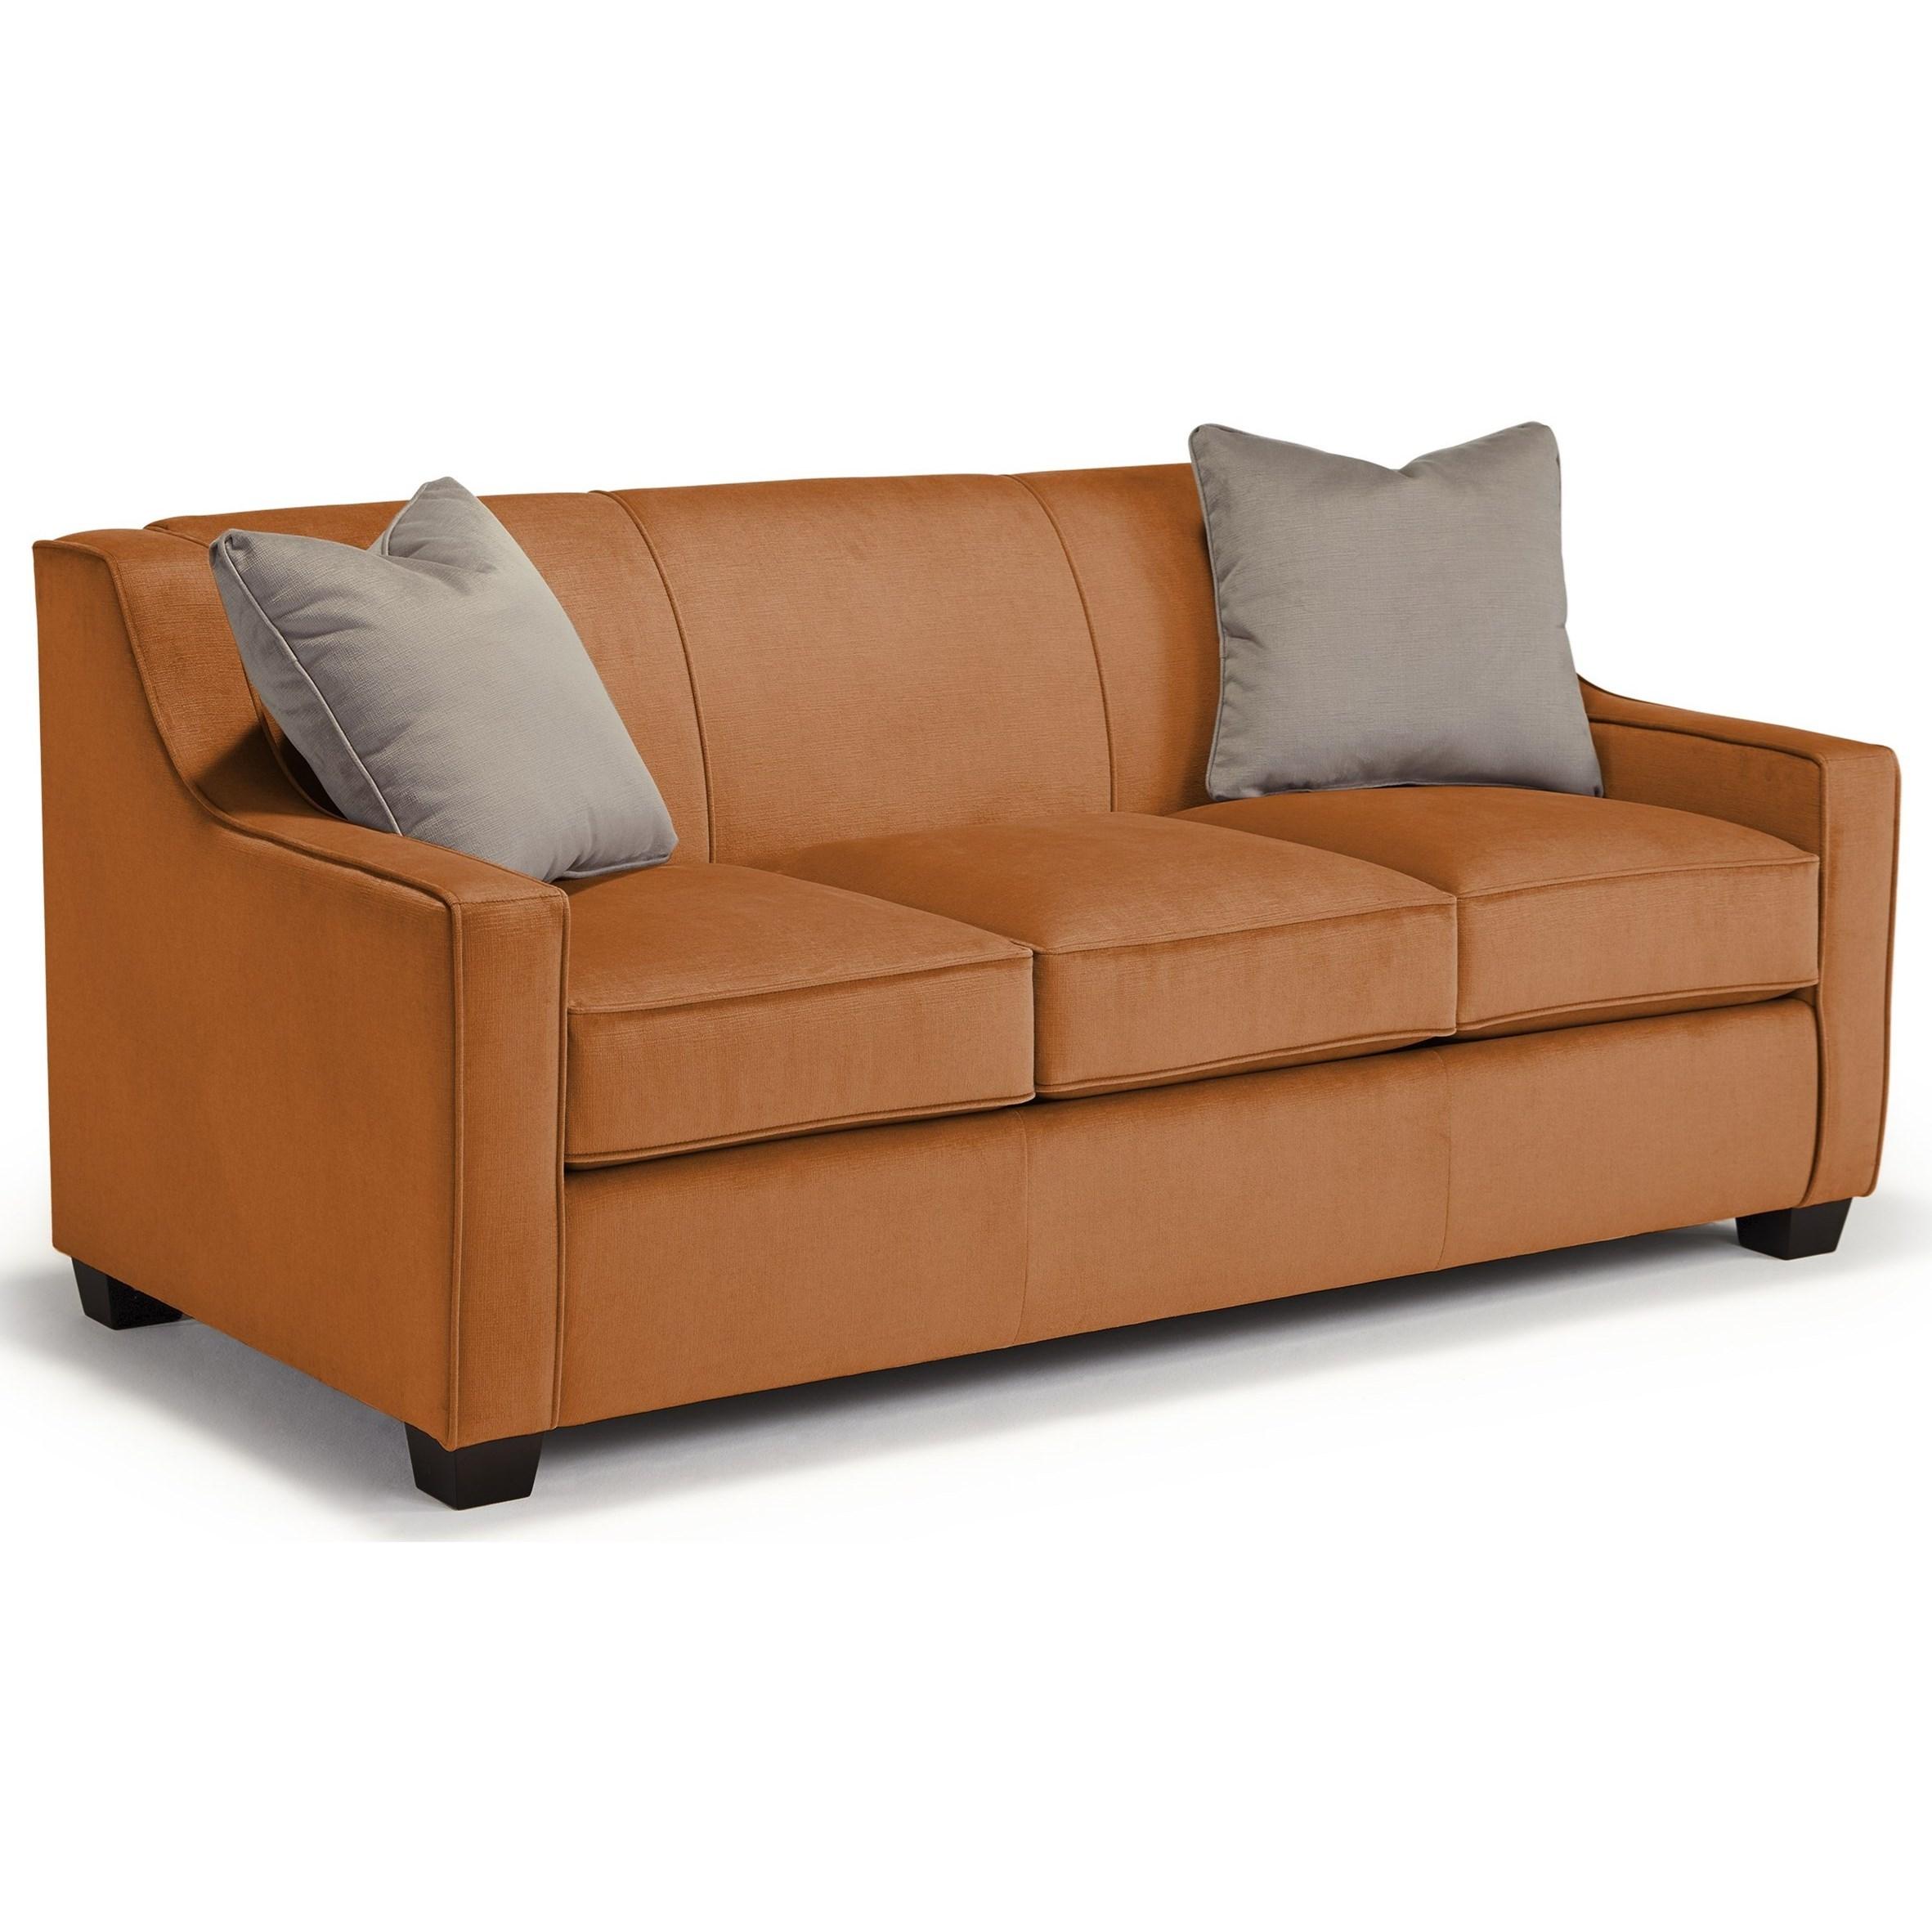 Marinette Full Sleeper by Best Home Furnishings at Lucas Furniture & Mattress